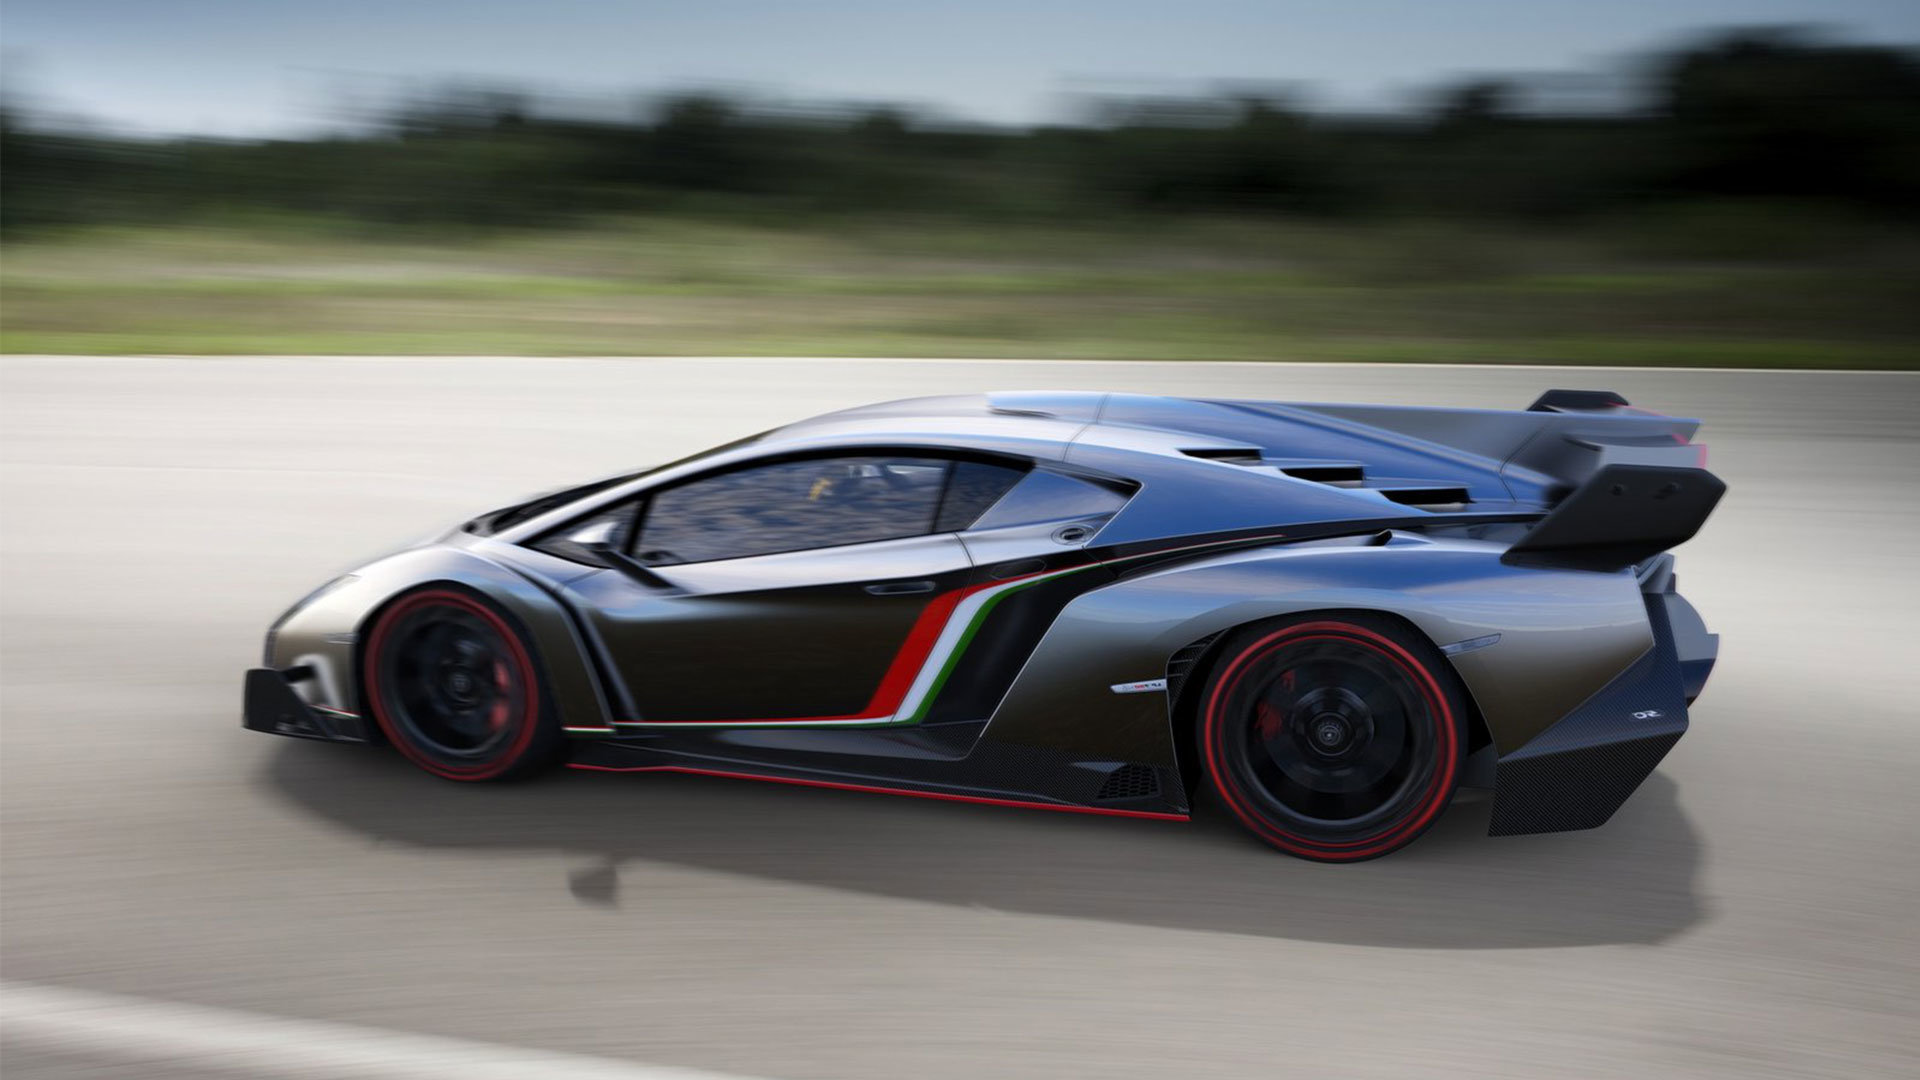 Best Lamborghini Veneno Background ID169388 For High Resolution Hd 1920x1080 PC